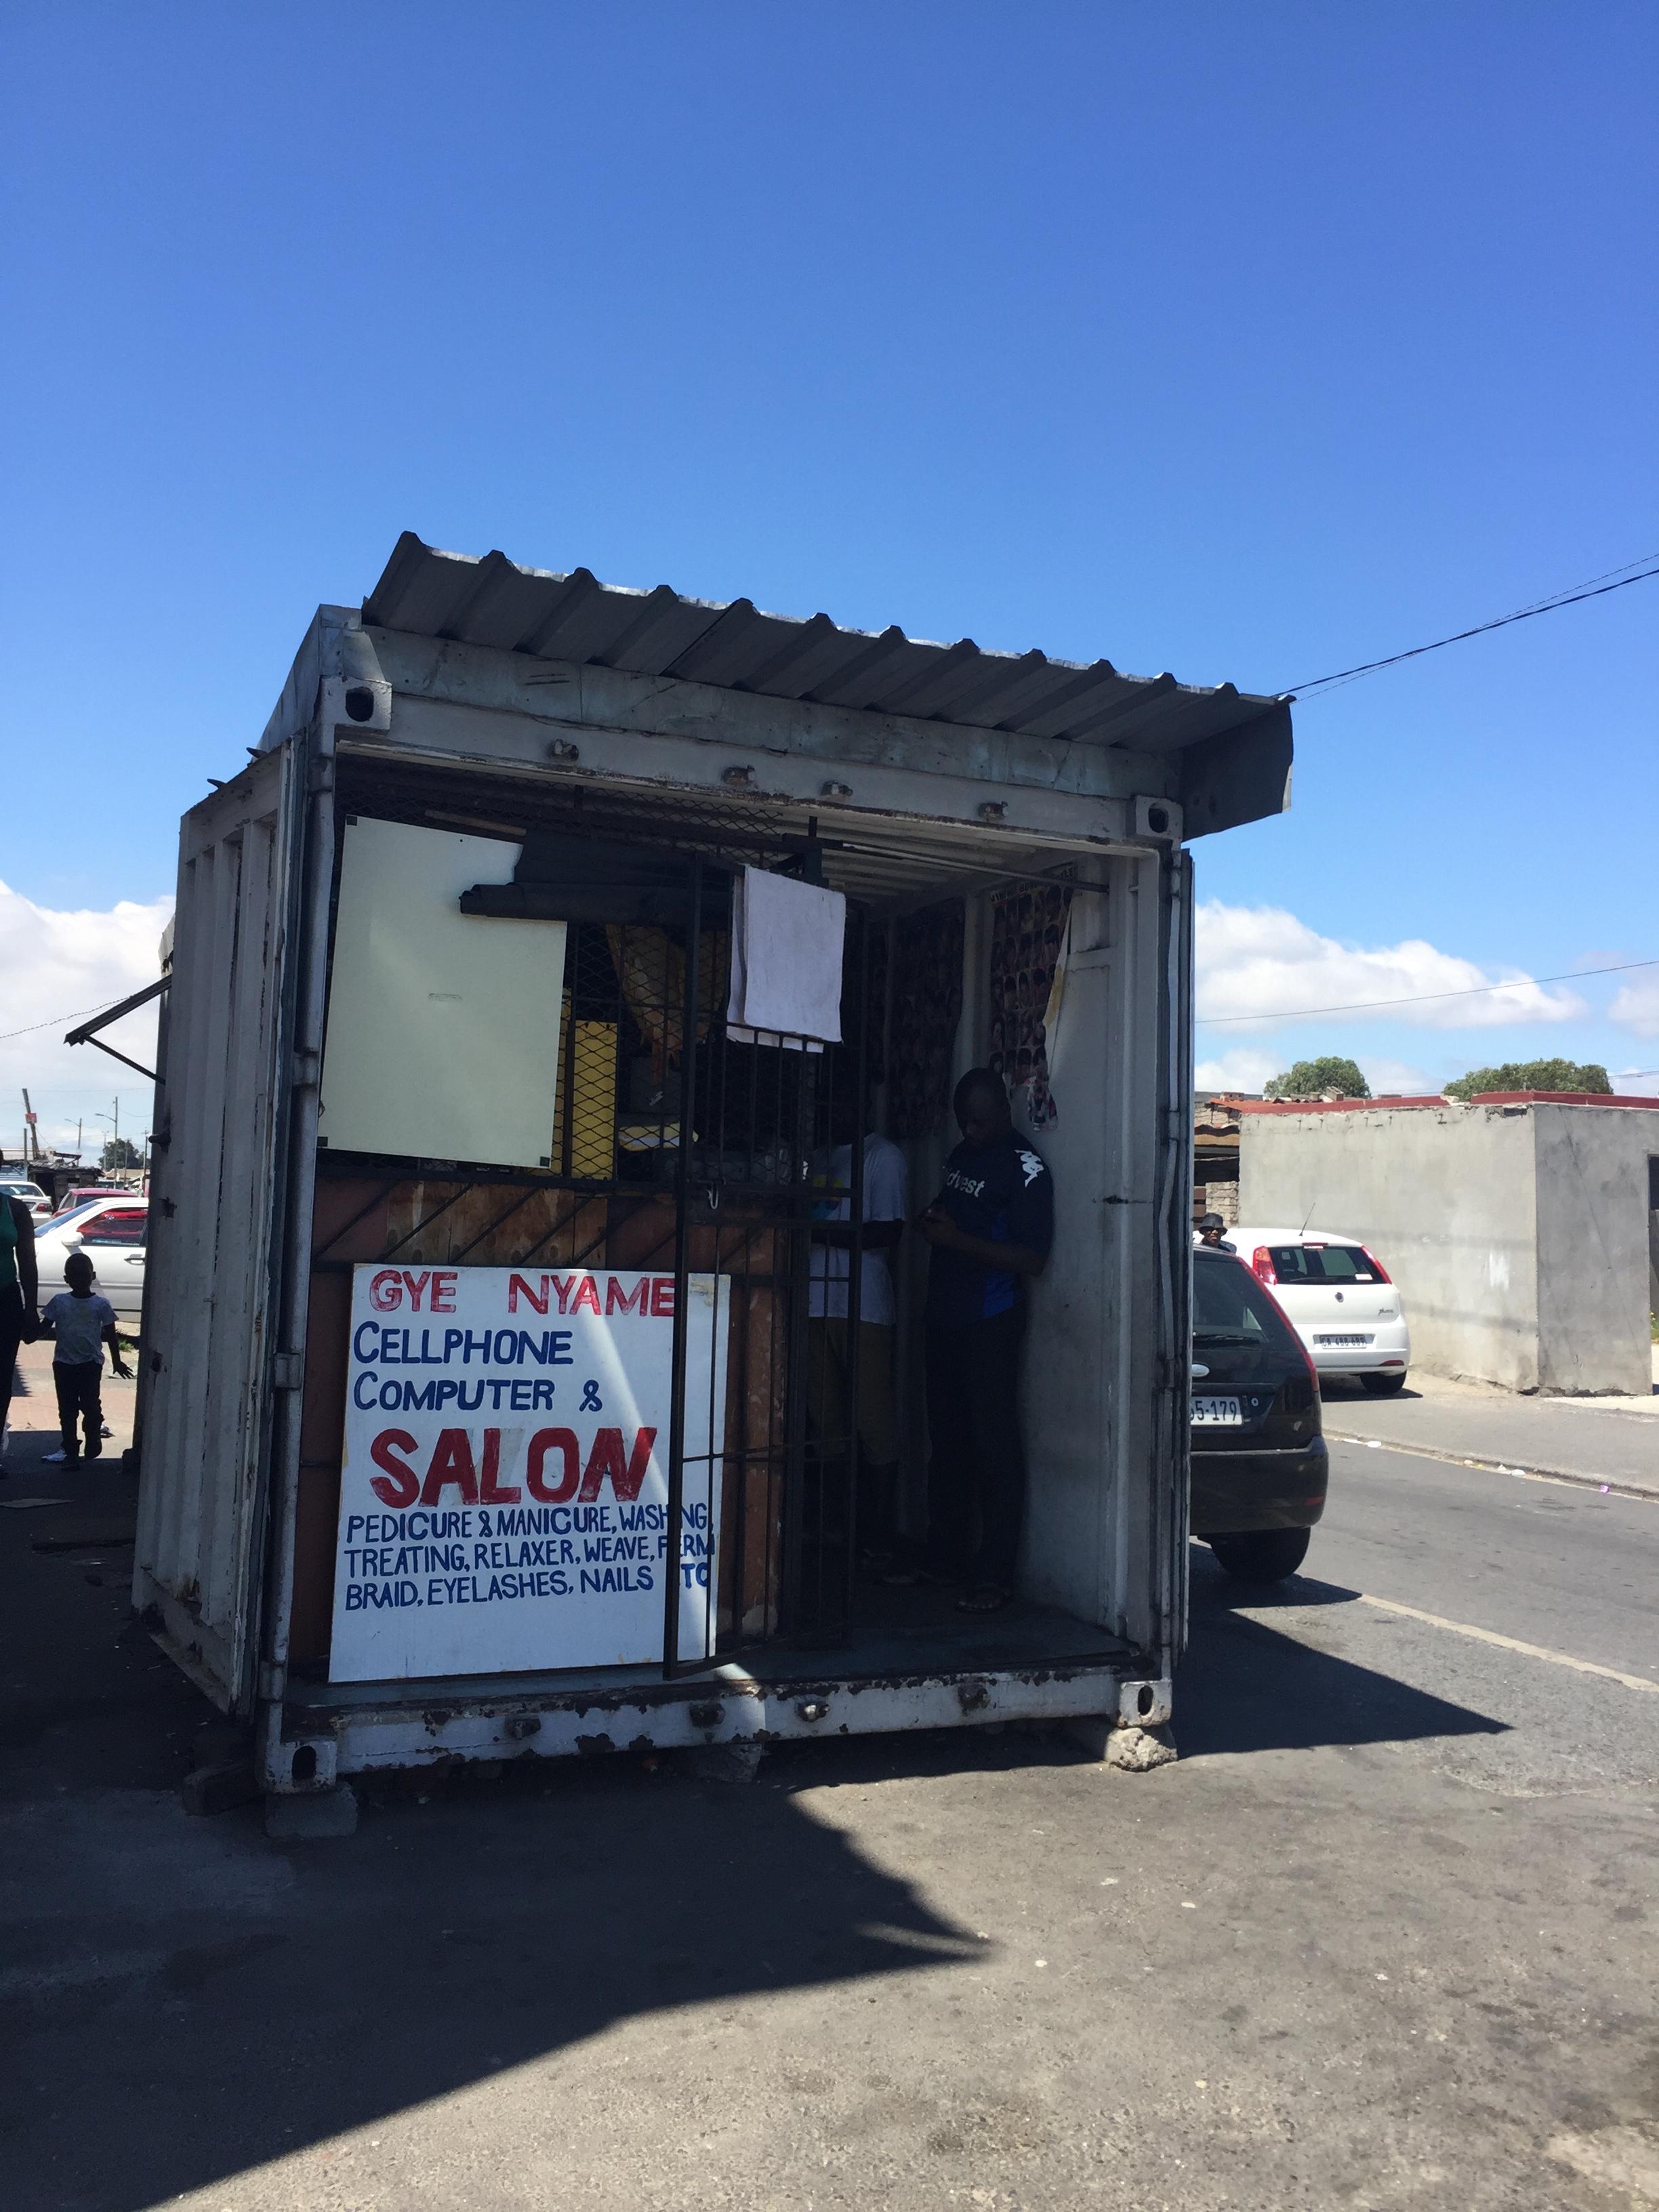 Hairdresser + Repair container